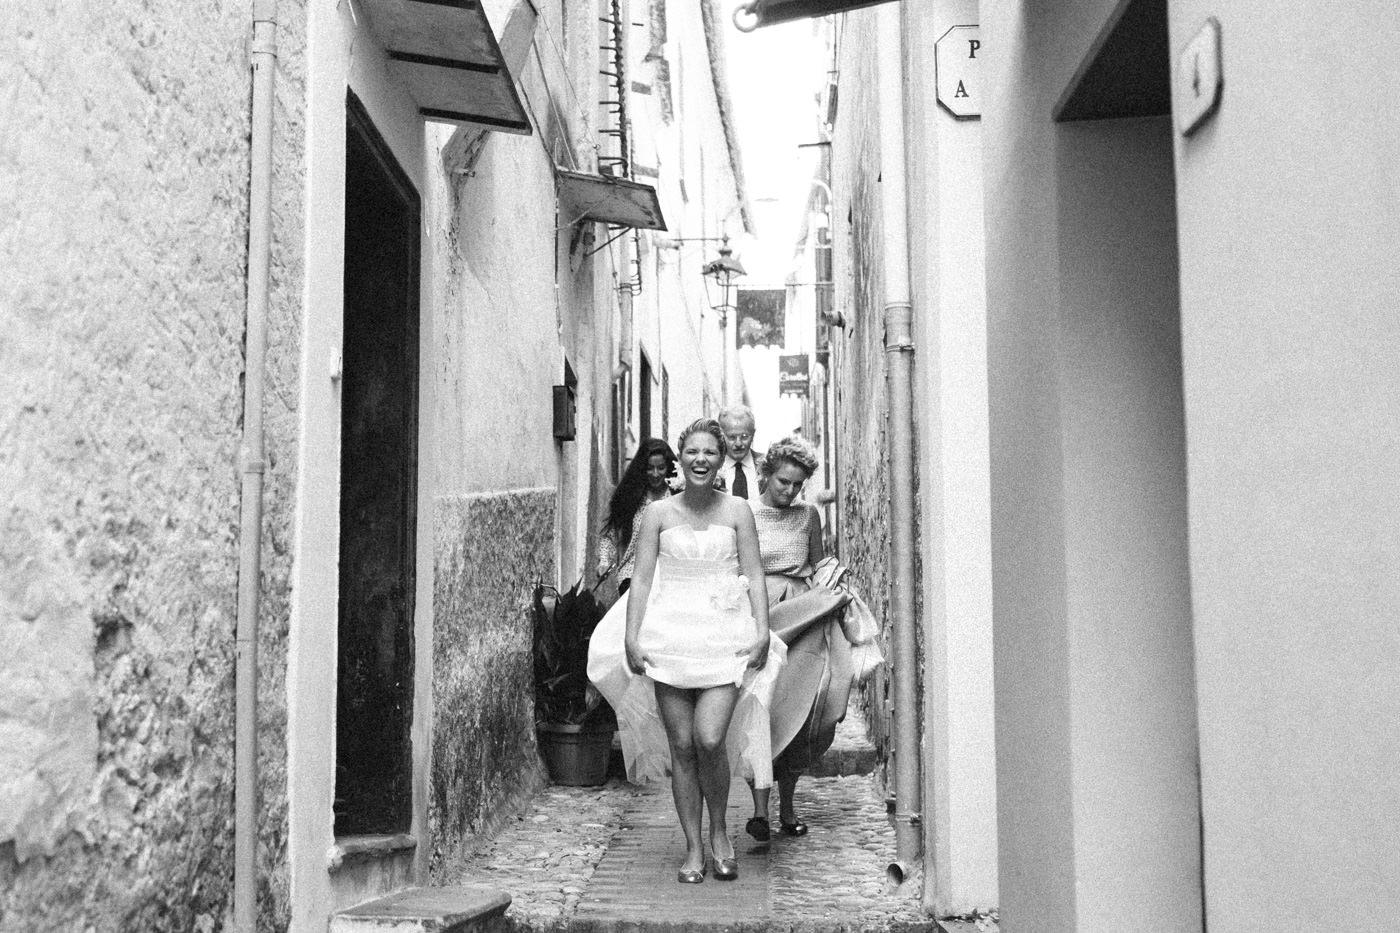 matrimoni_all_italiana_fotografo_matrimonio_cinque_terre-17.jpg